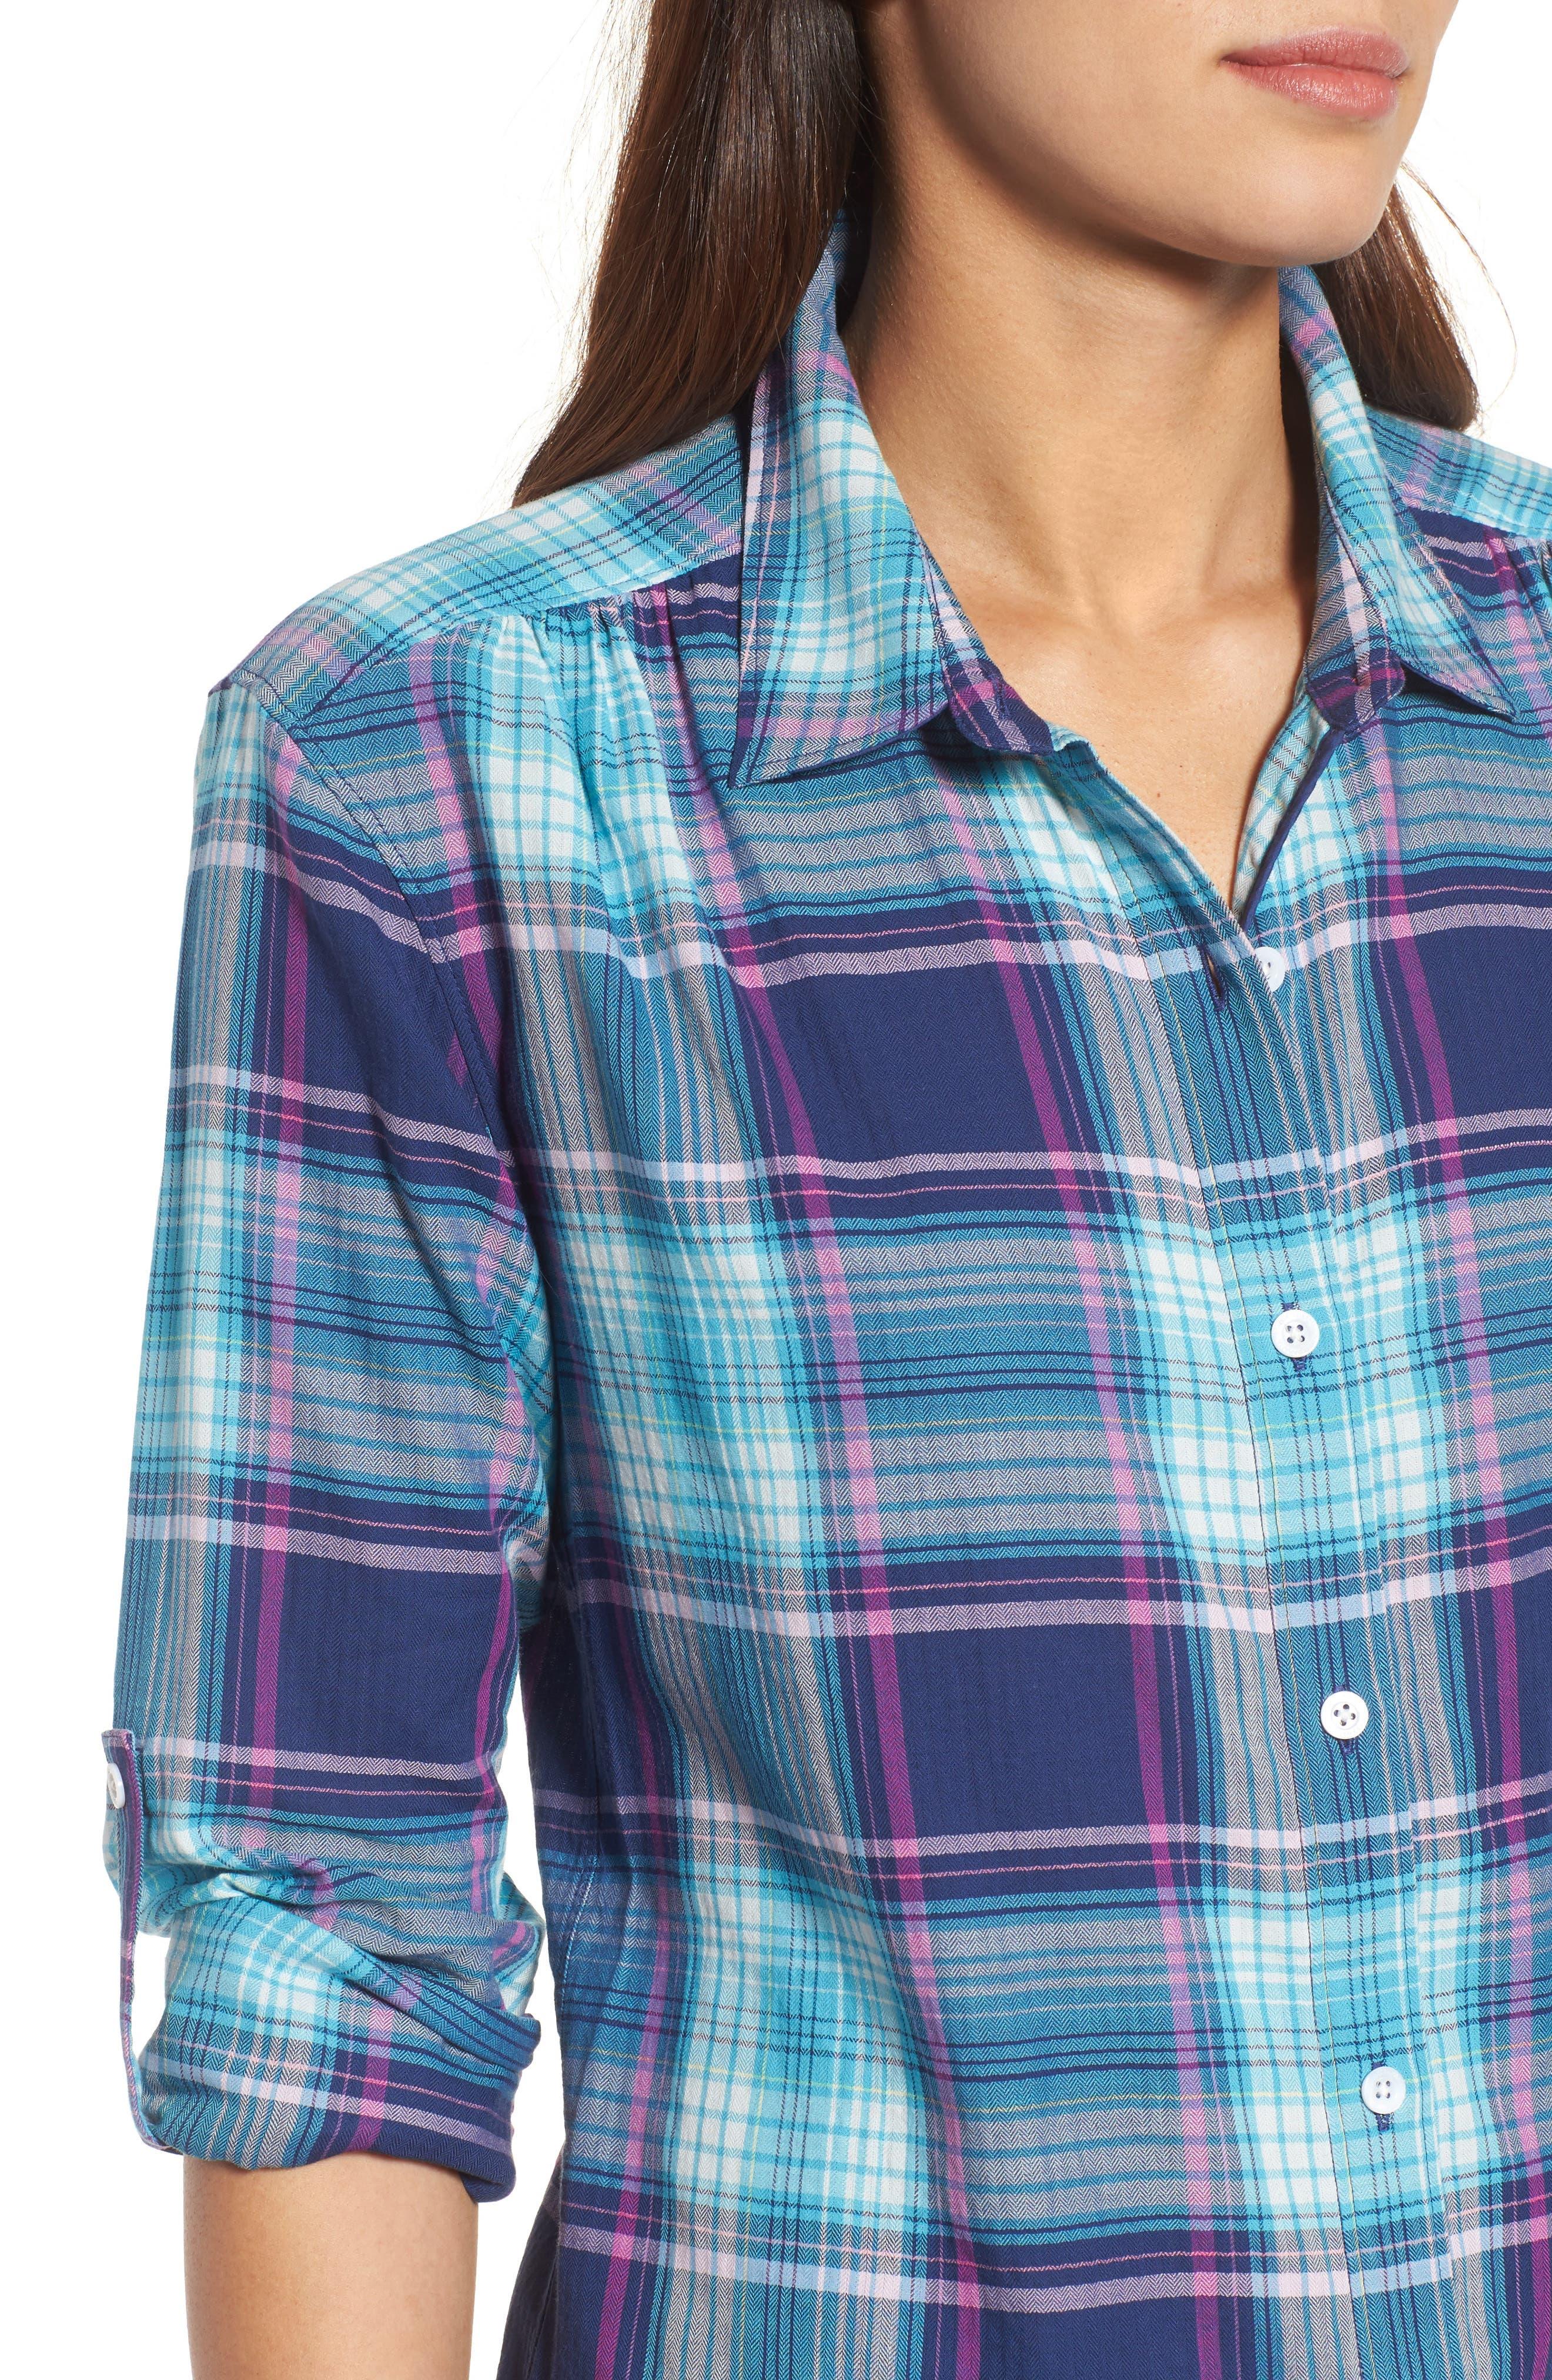 Play it Again Plaid Long Sleeve Shirt,                             Alternate thumbnail 4, color,                             Kingdom Blue